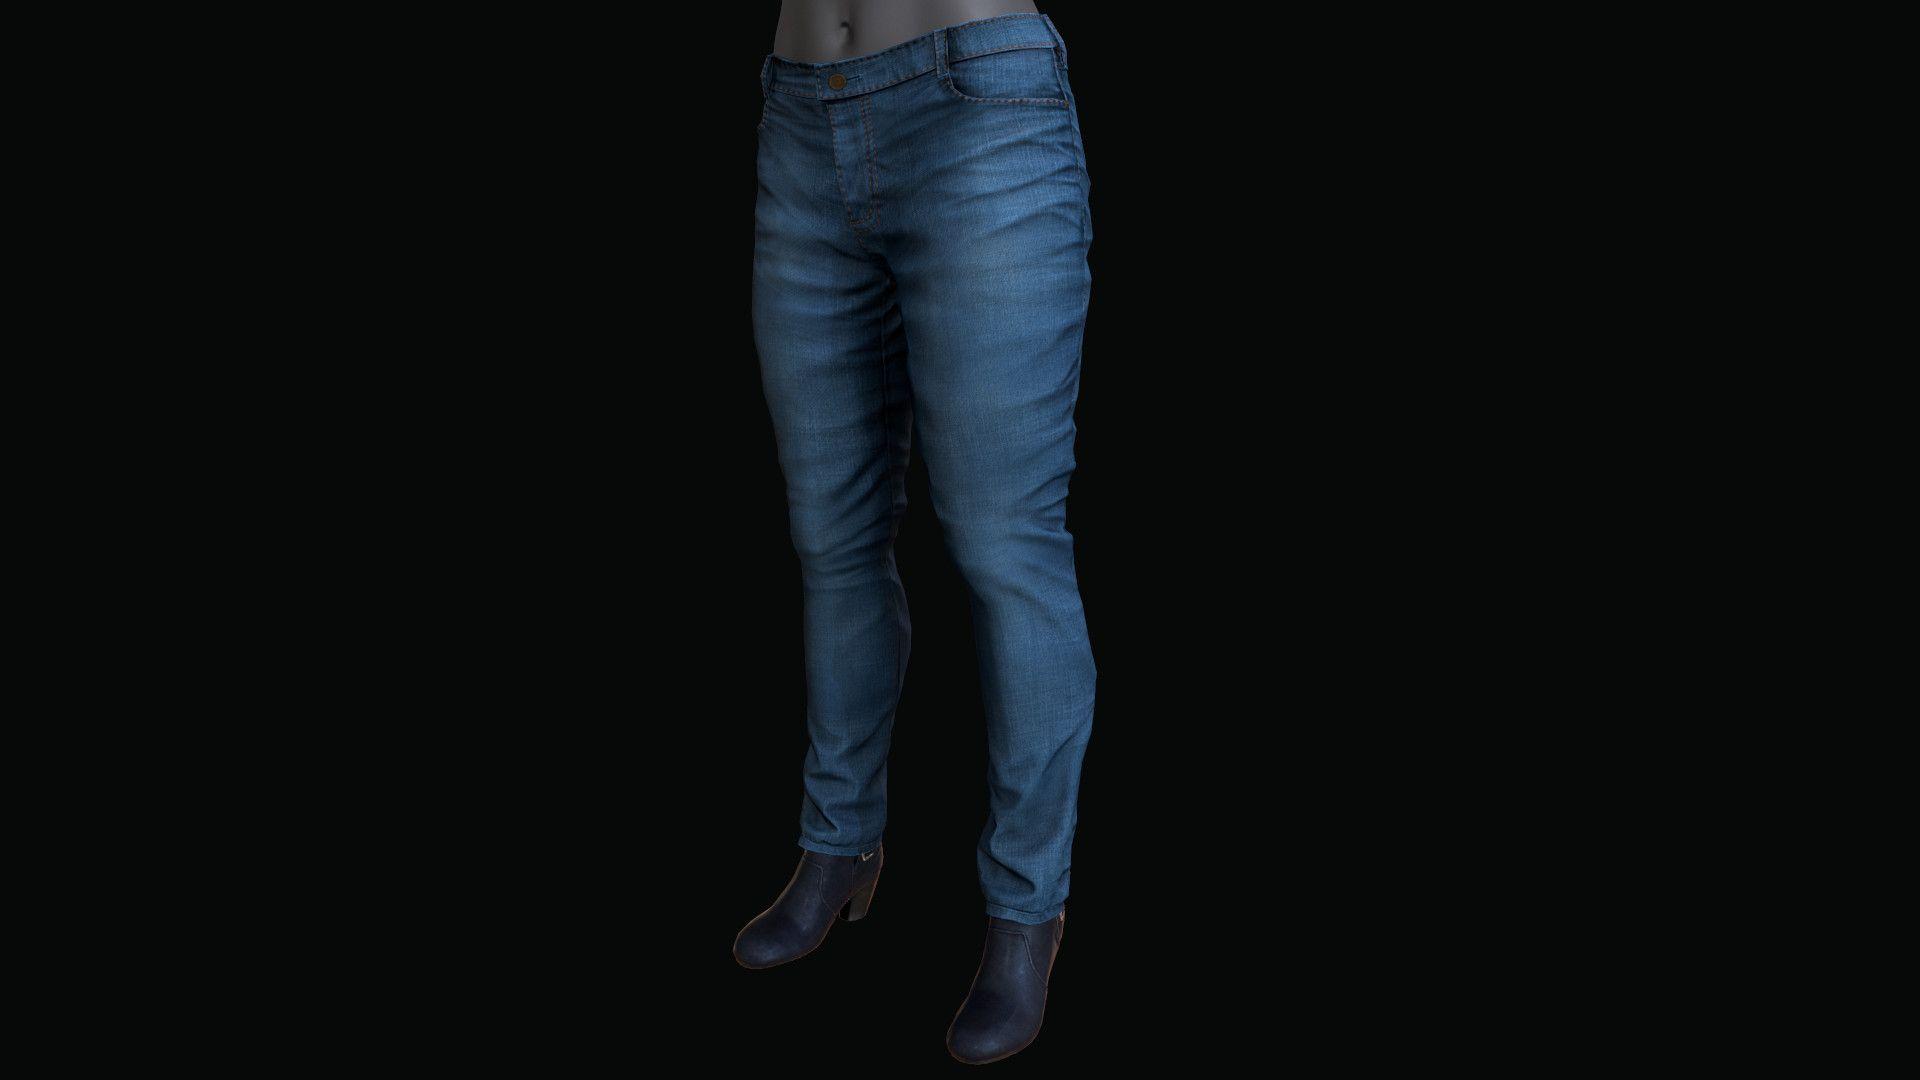 Pants Shoes 3D Model - 3D Model